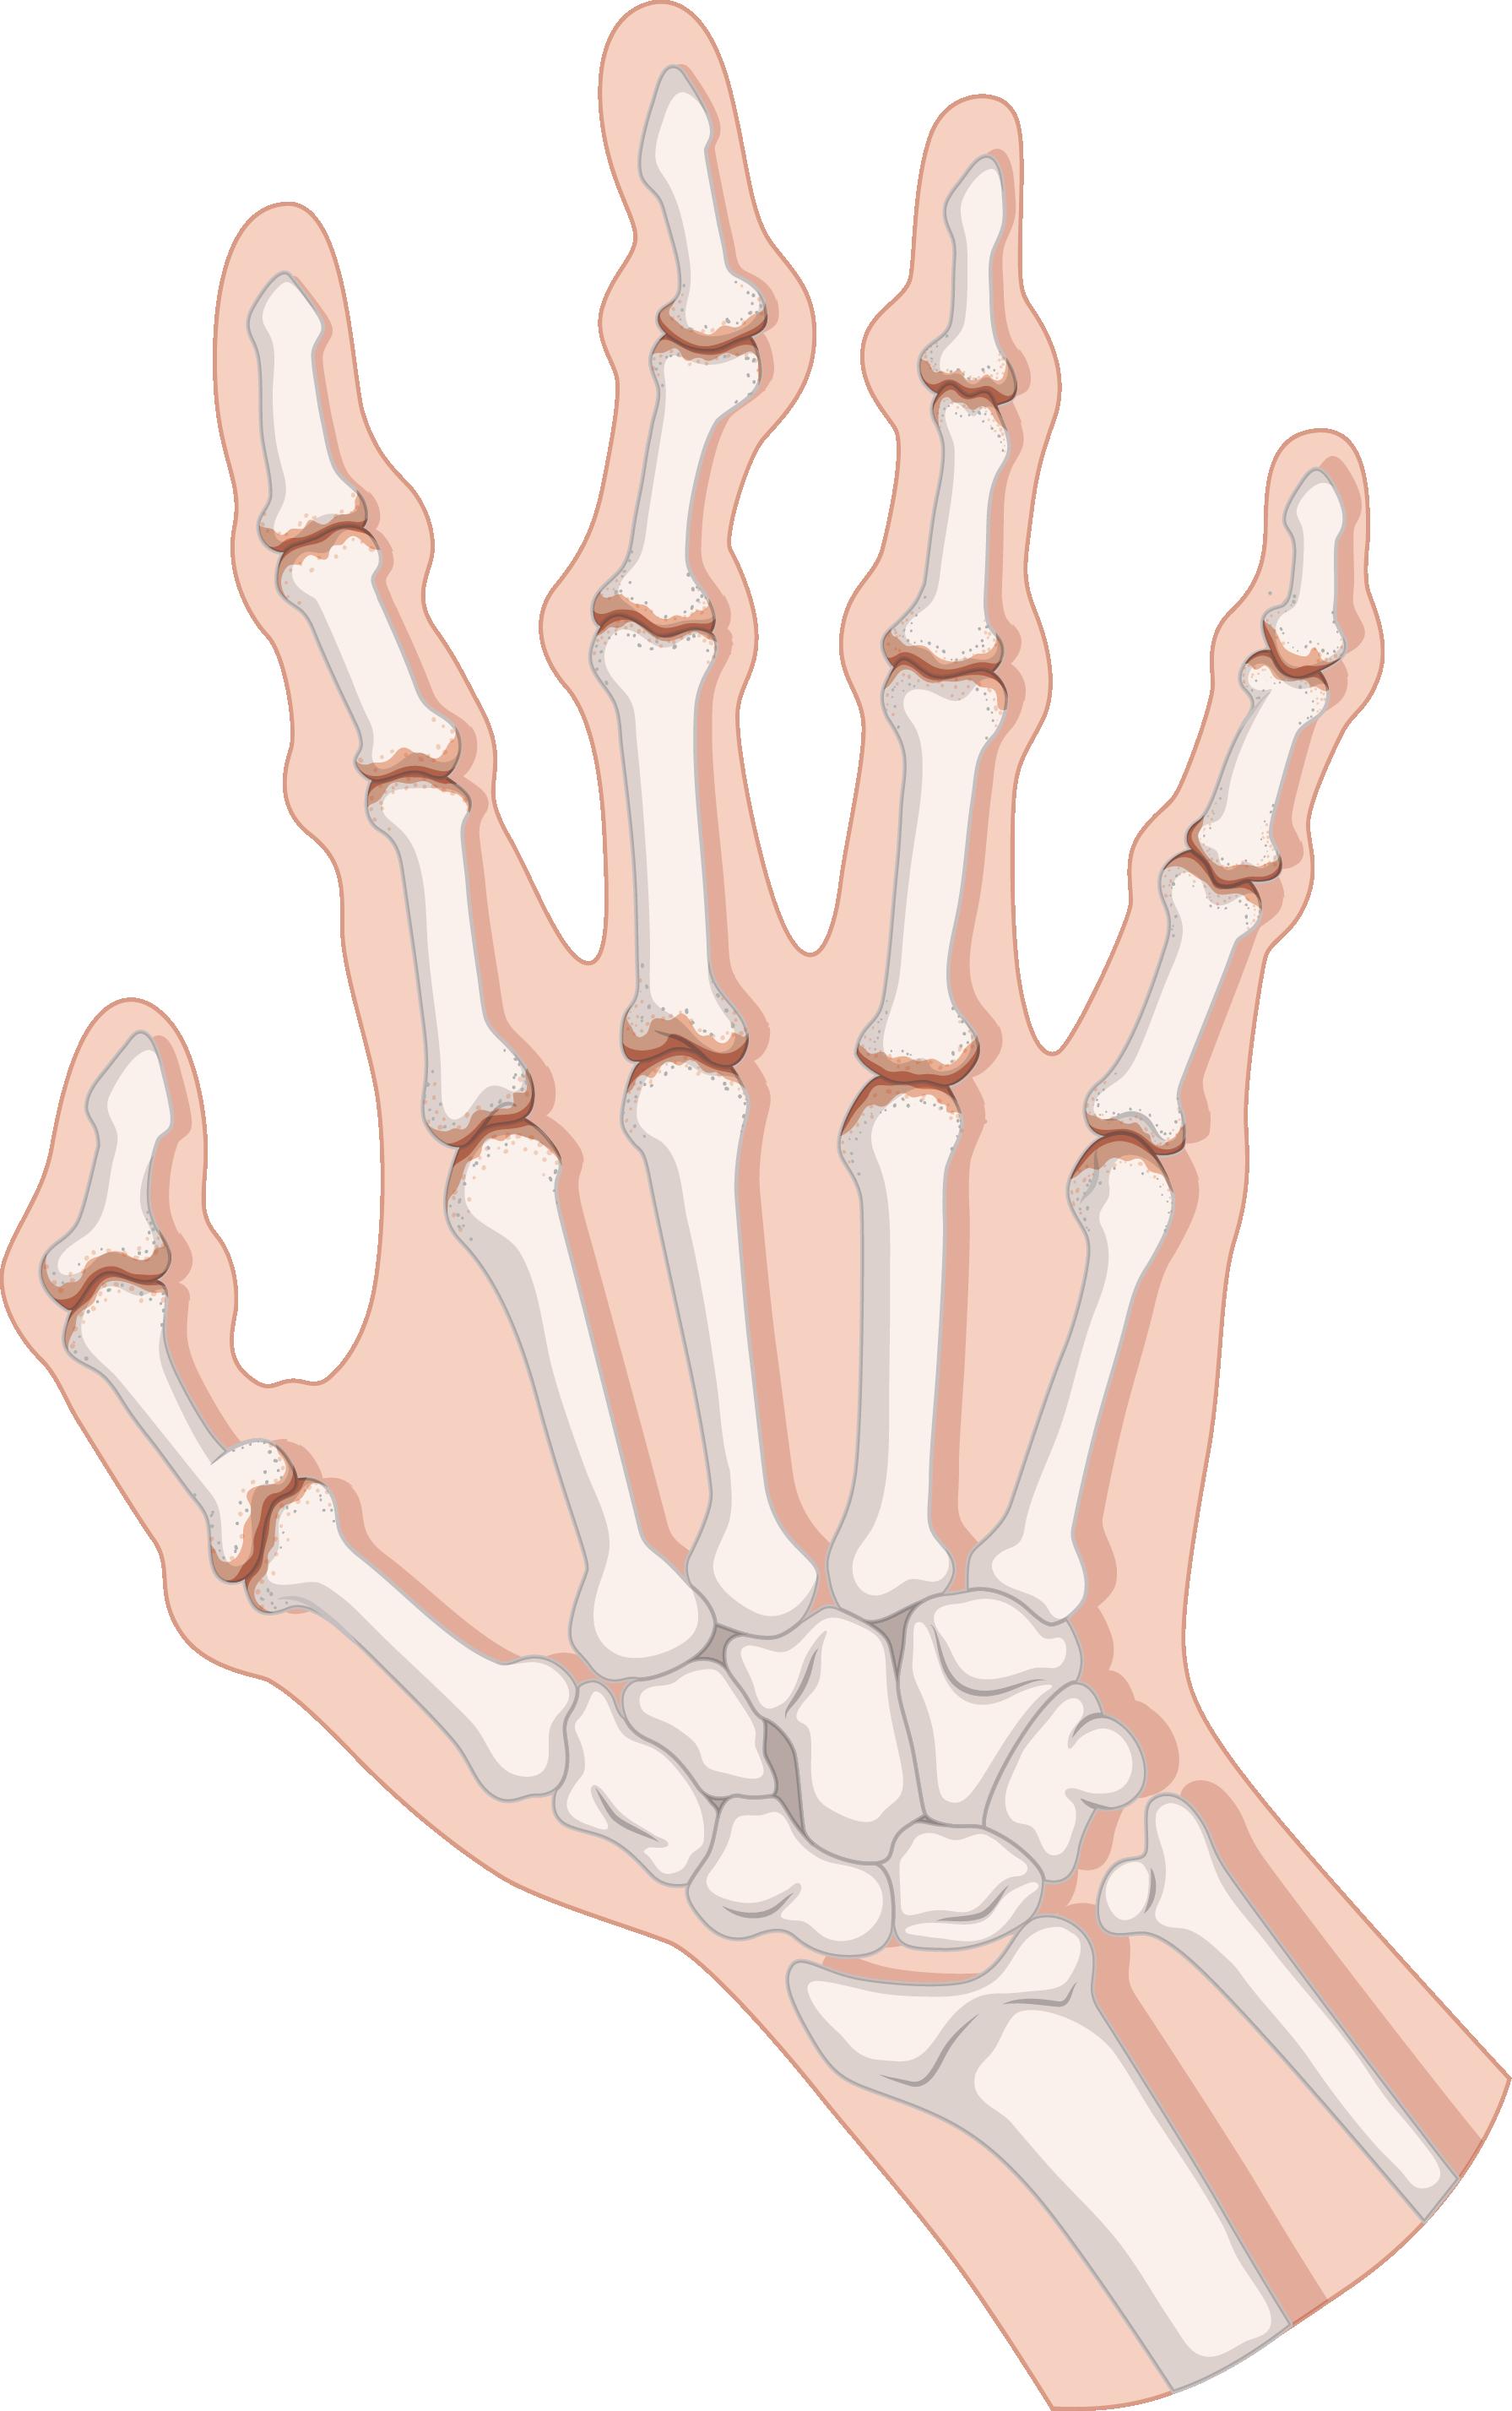 Hurt clipart arthritis, Hurt arthritis Transparent FREE for.